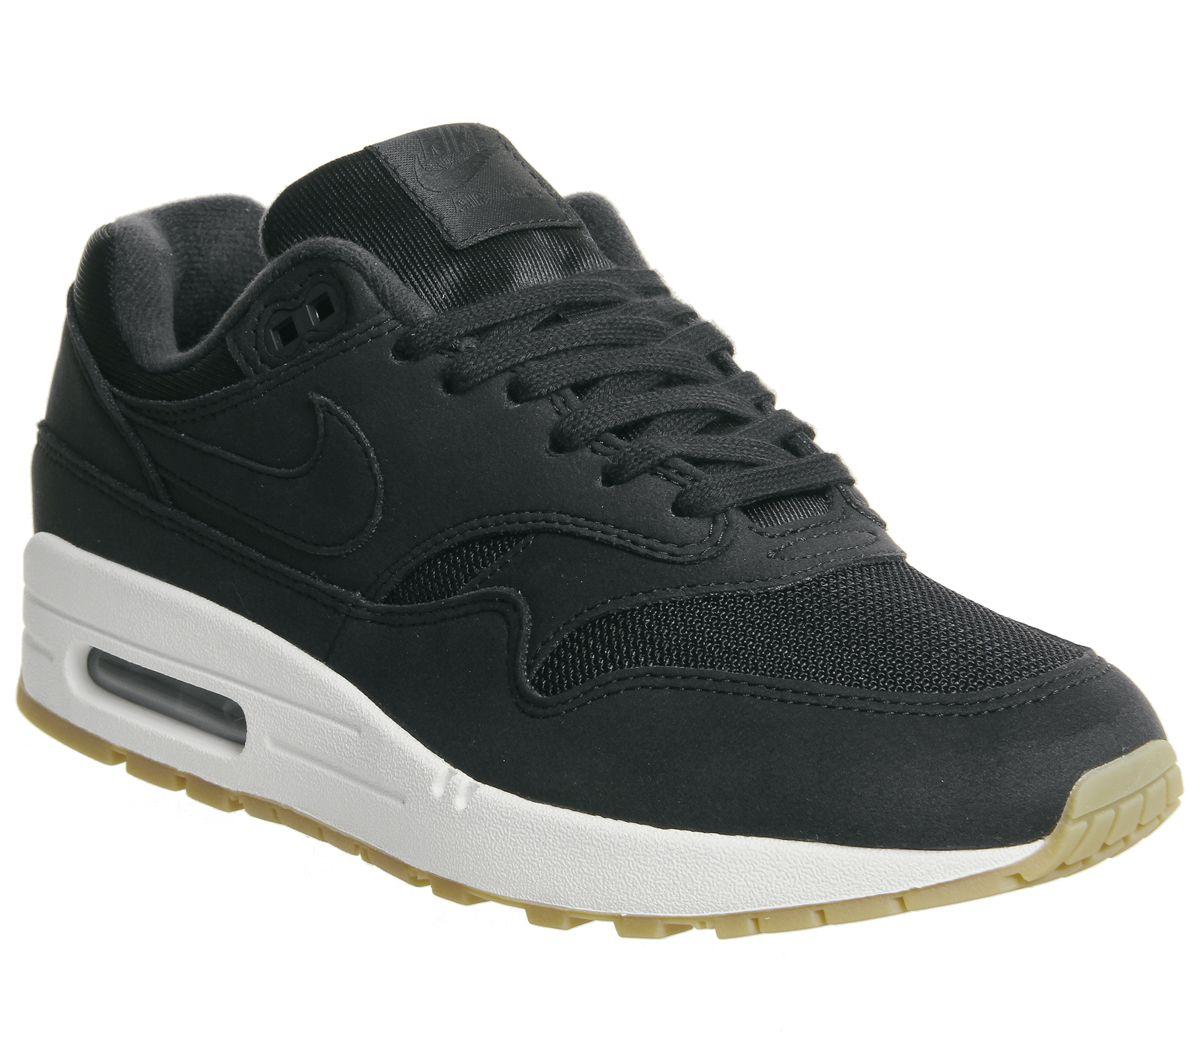 b8c0956907f33 Nike Air Max 1 Trainers Black Gum F - Hers trainers